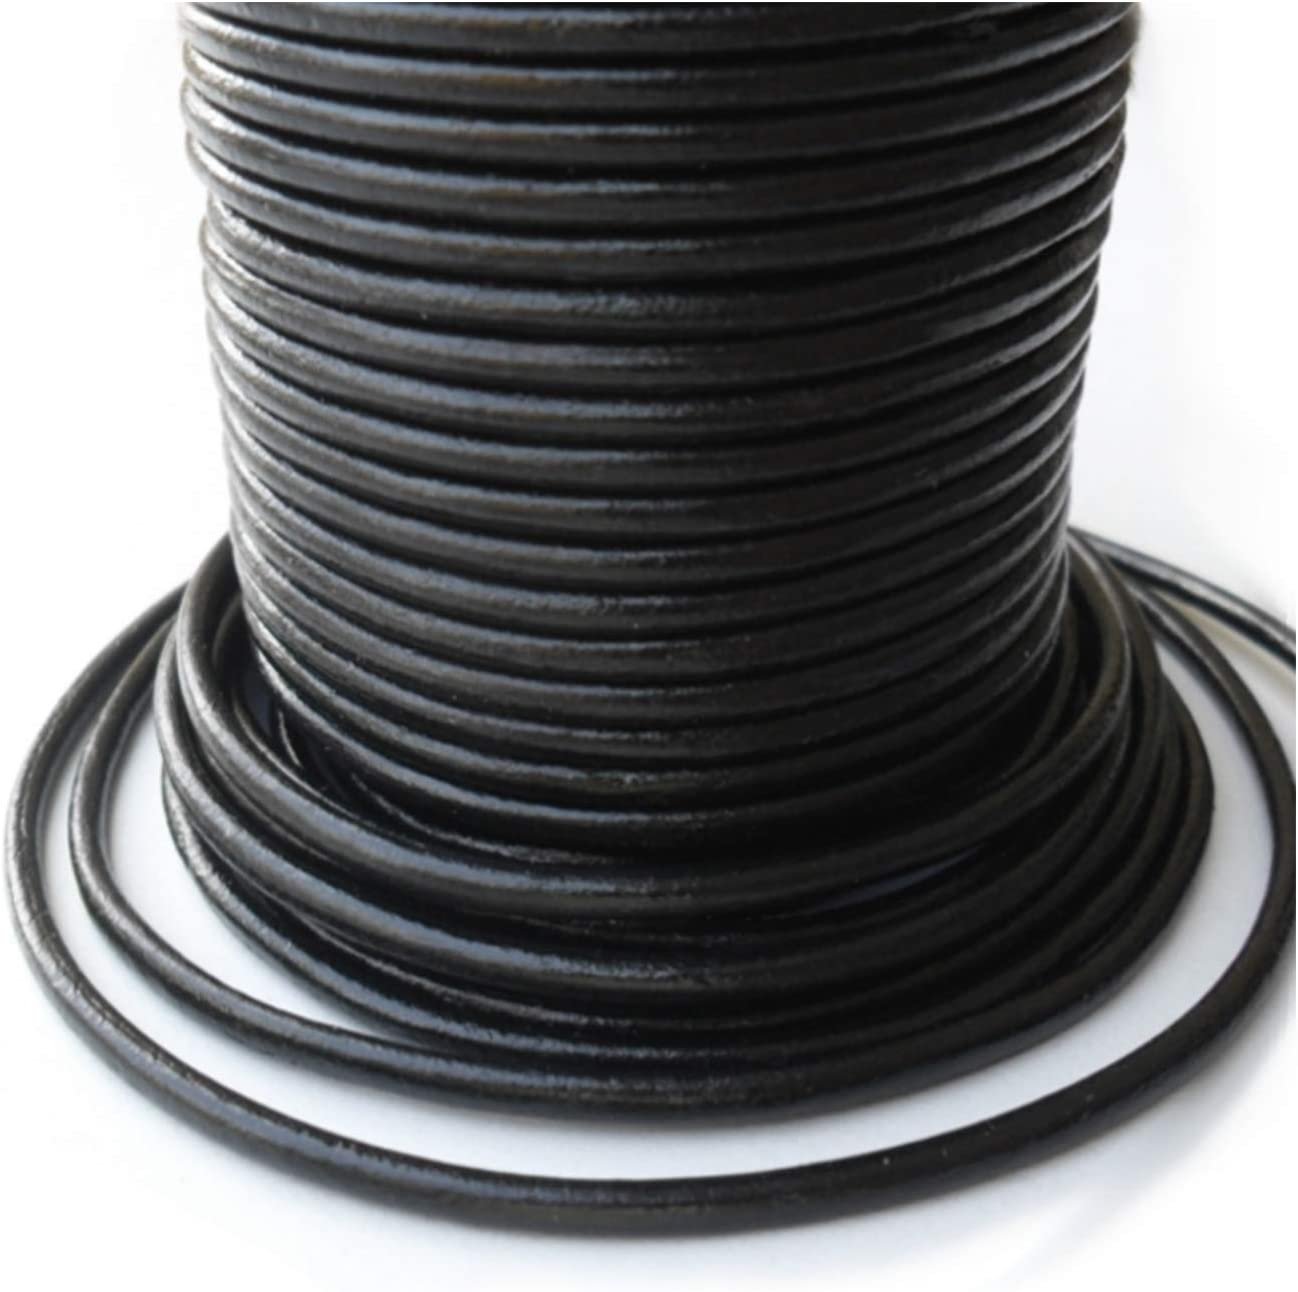 Lederband 1,5mm schwarz Rindsleder 1m    0012